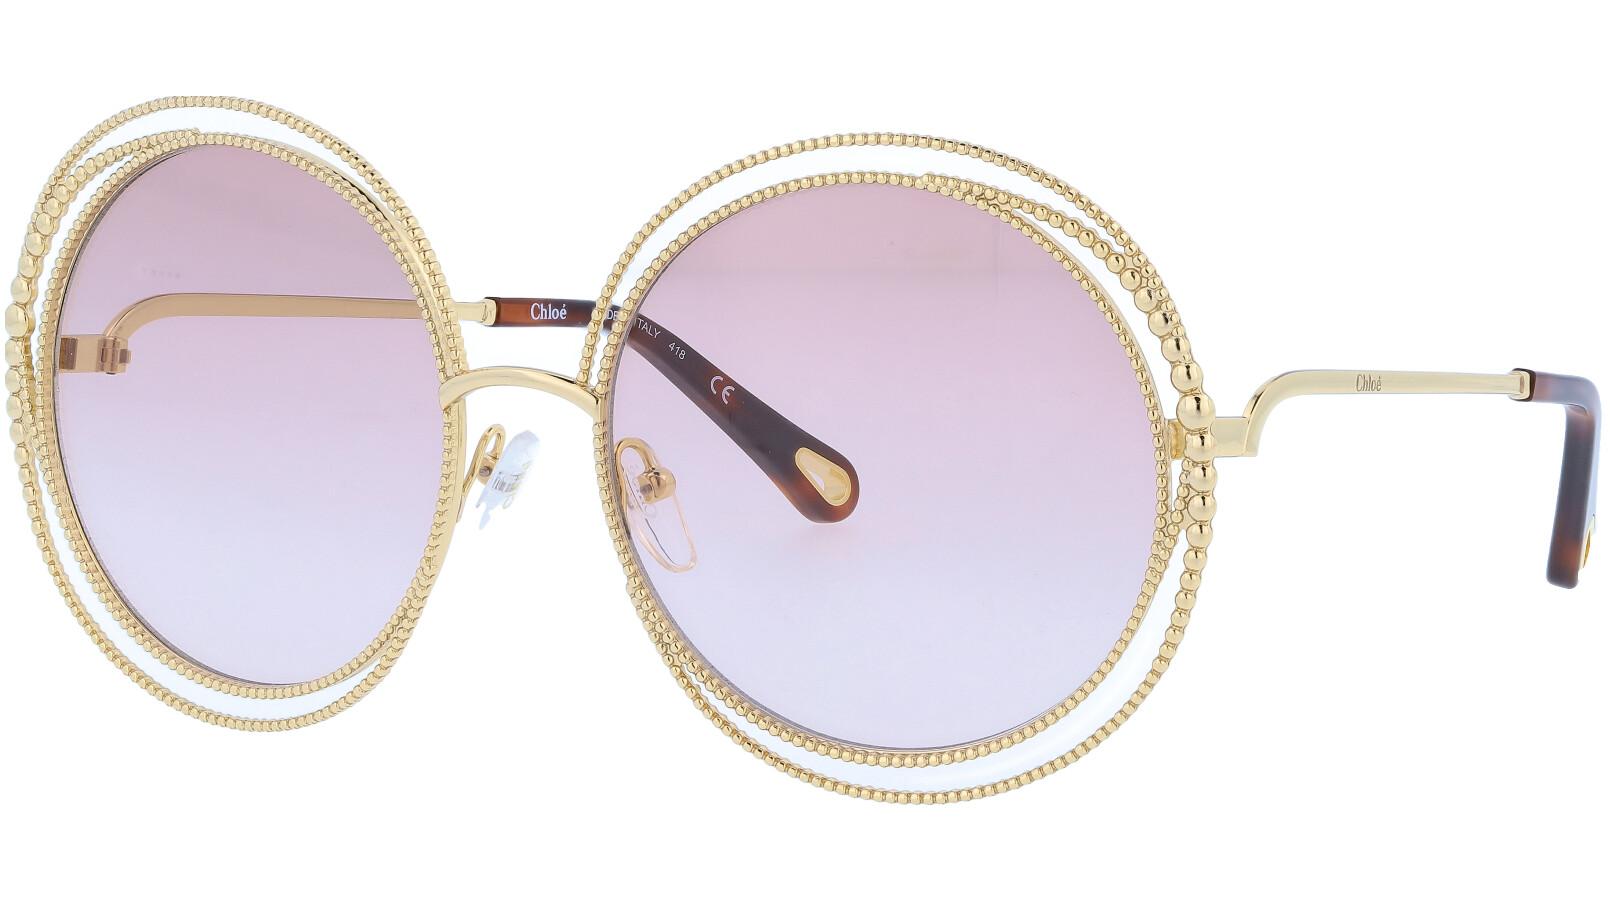 CHLOE CE114SC 722 58 Gold Round Sunglasses